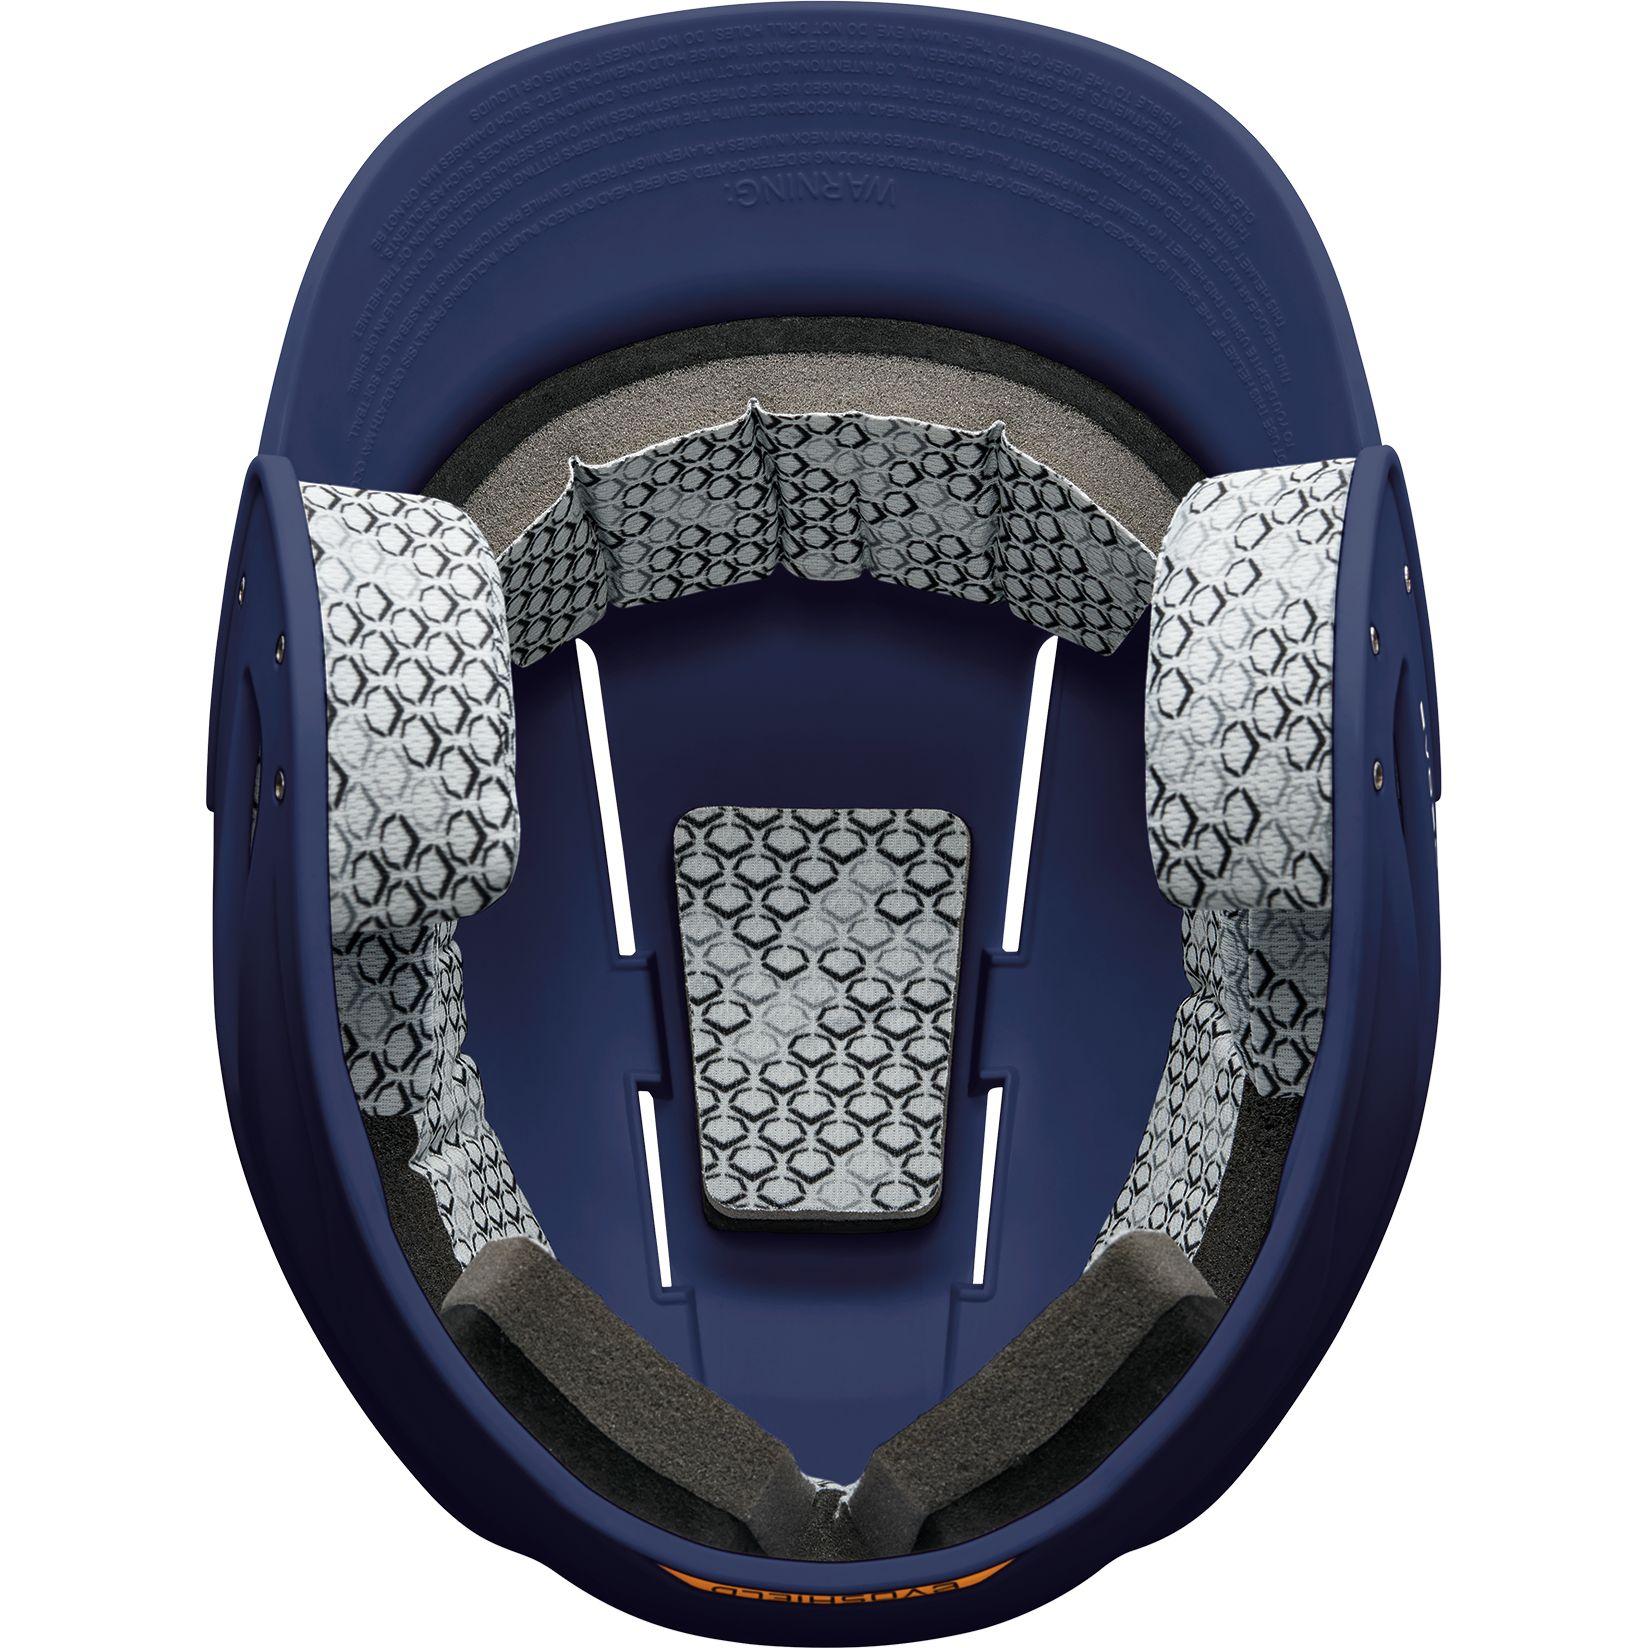 EvoShield Impact Travel Ball Batters Helmet